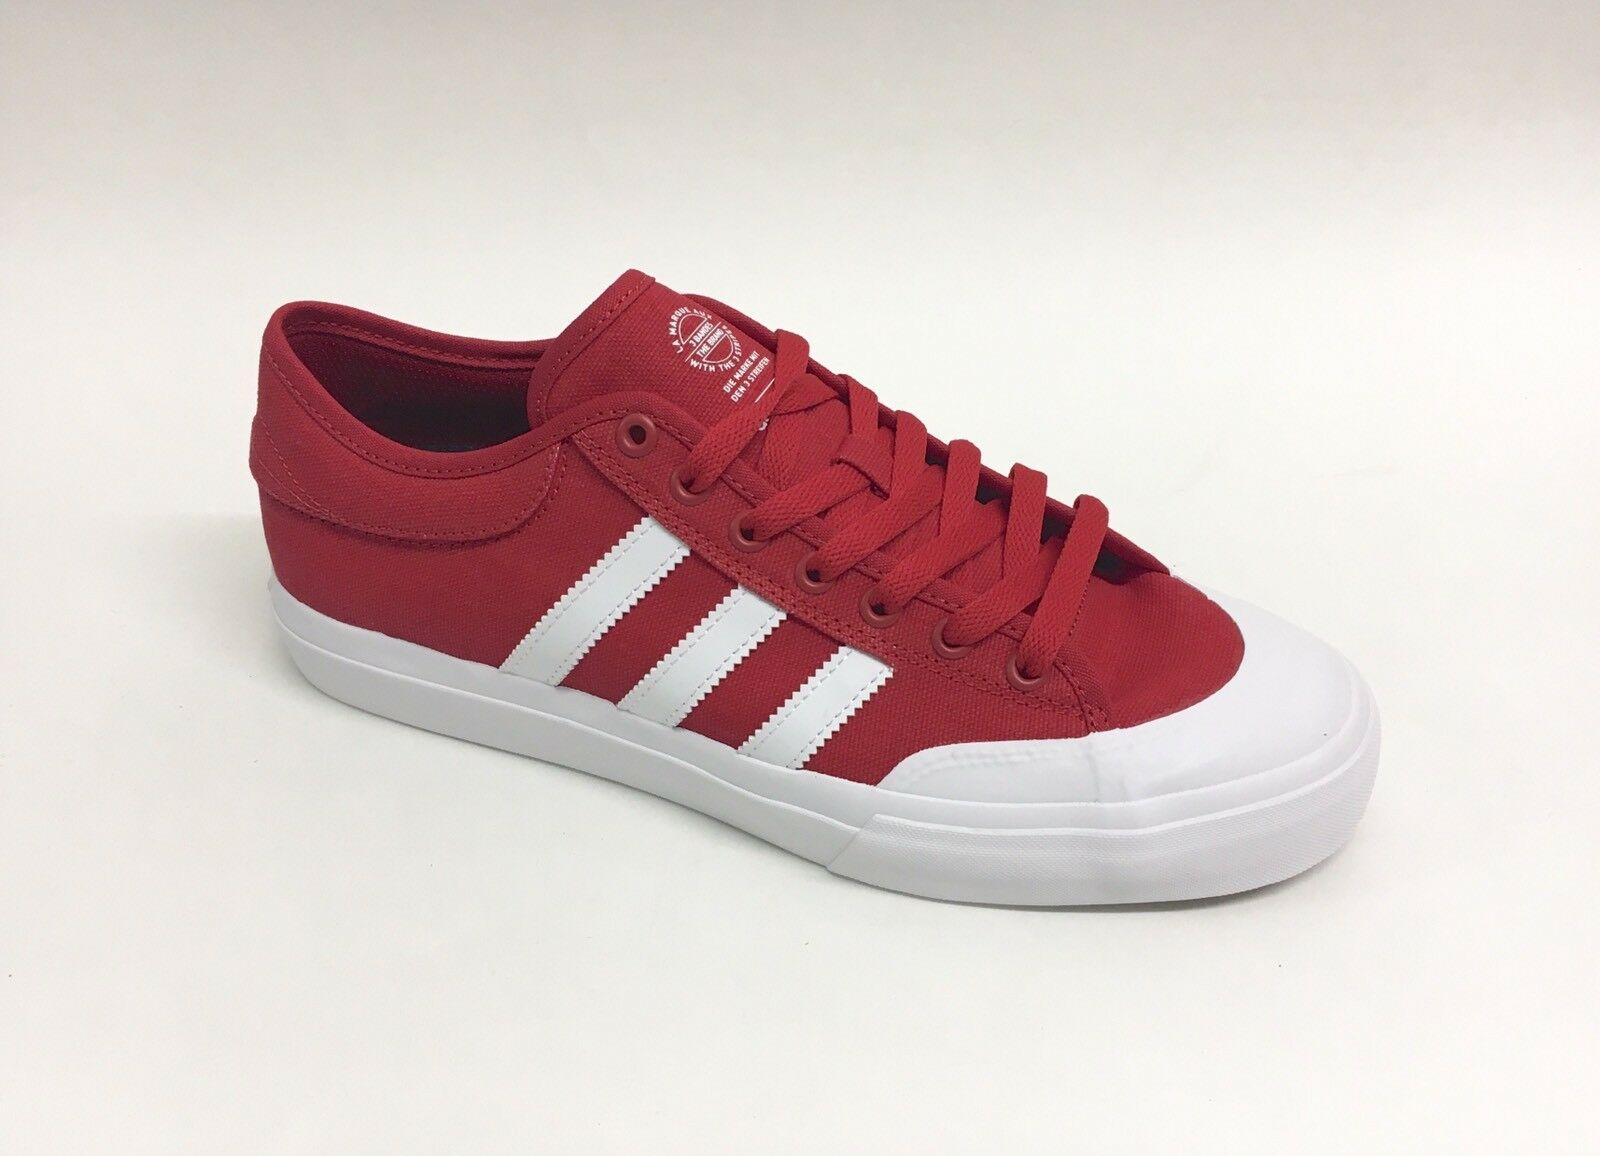 Adidas Skateboarding Matchcourt Shoe Scarlet Red Men's Size 11